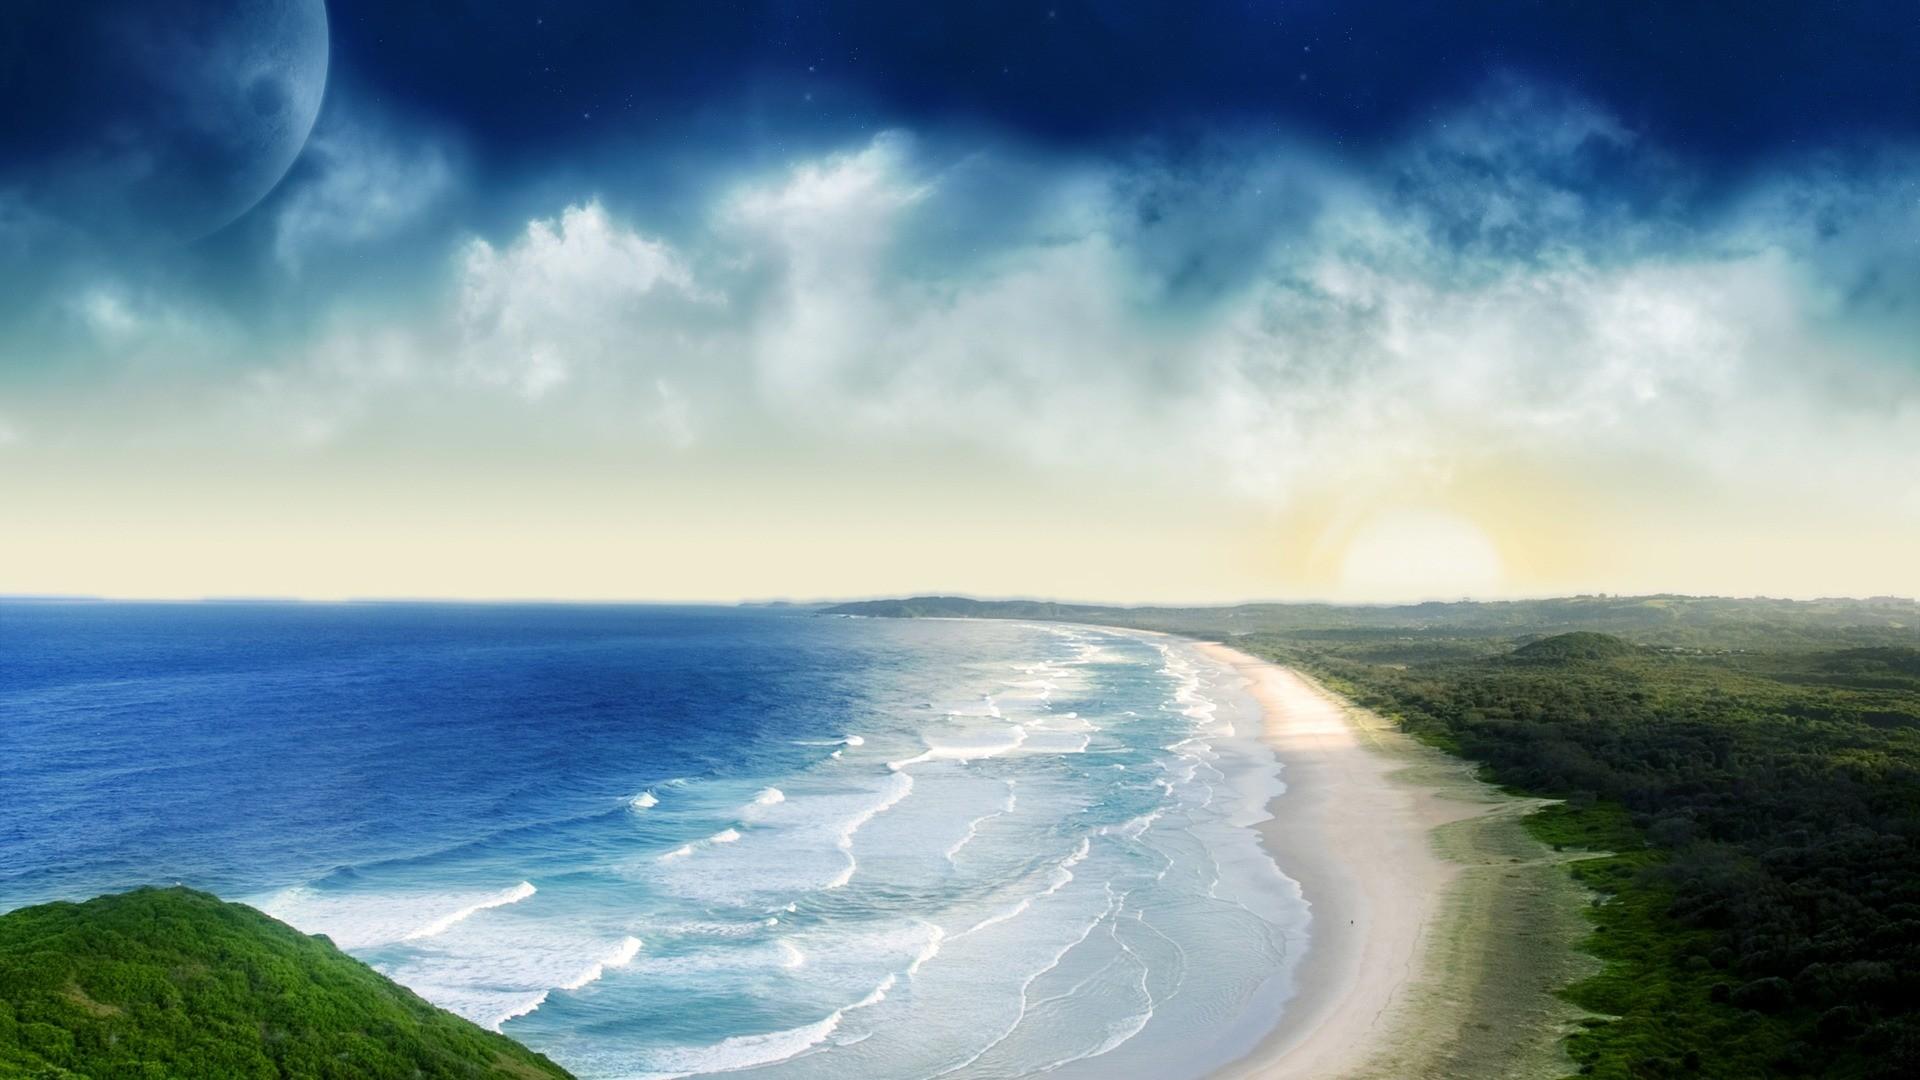 Coastal Sunset Wallpaper Photo Manipulated Nature Wallpapers